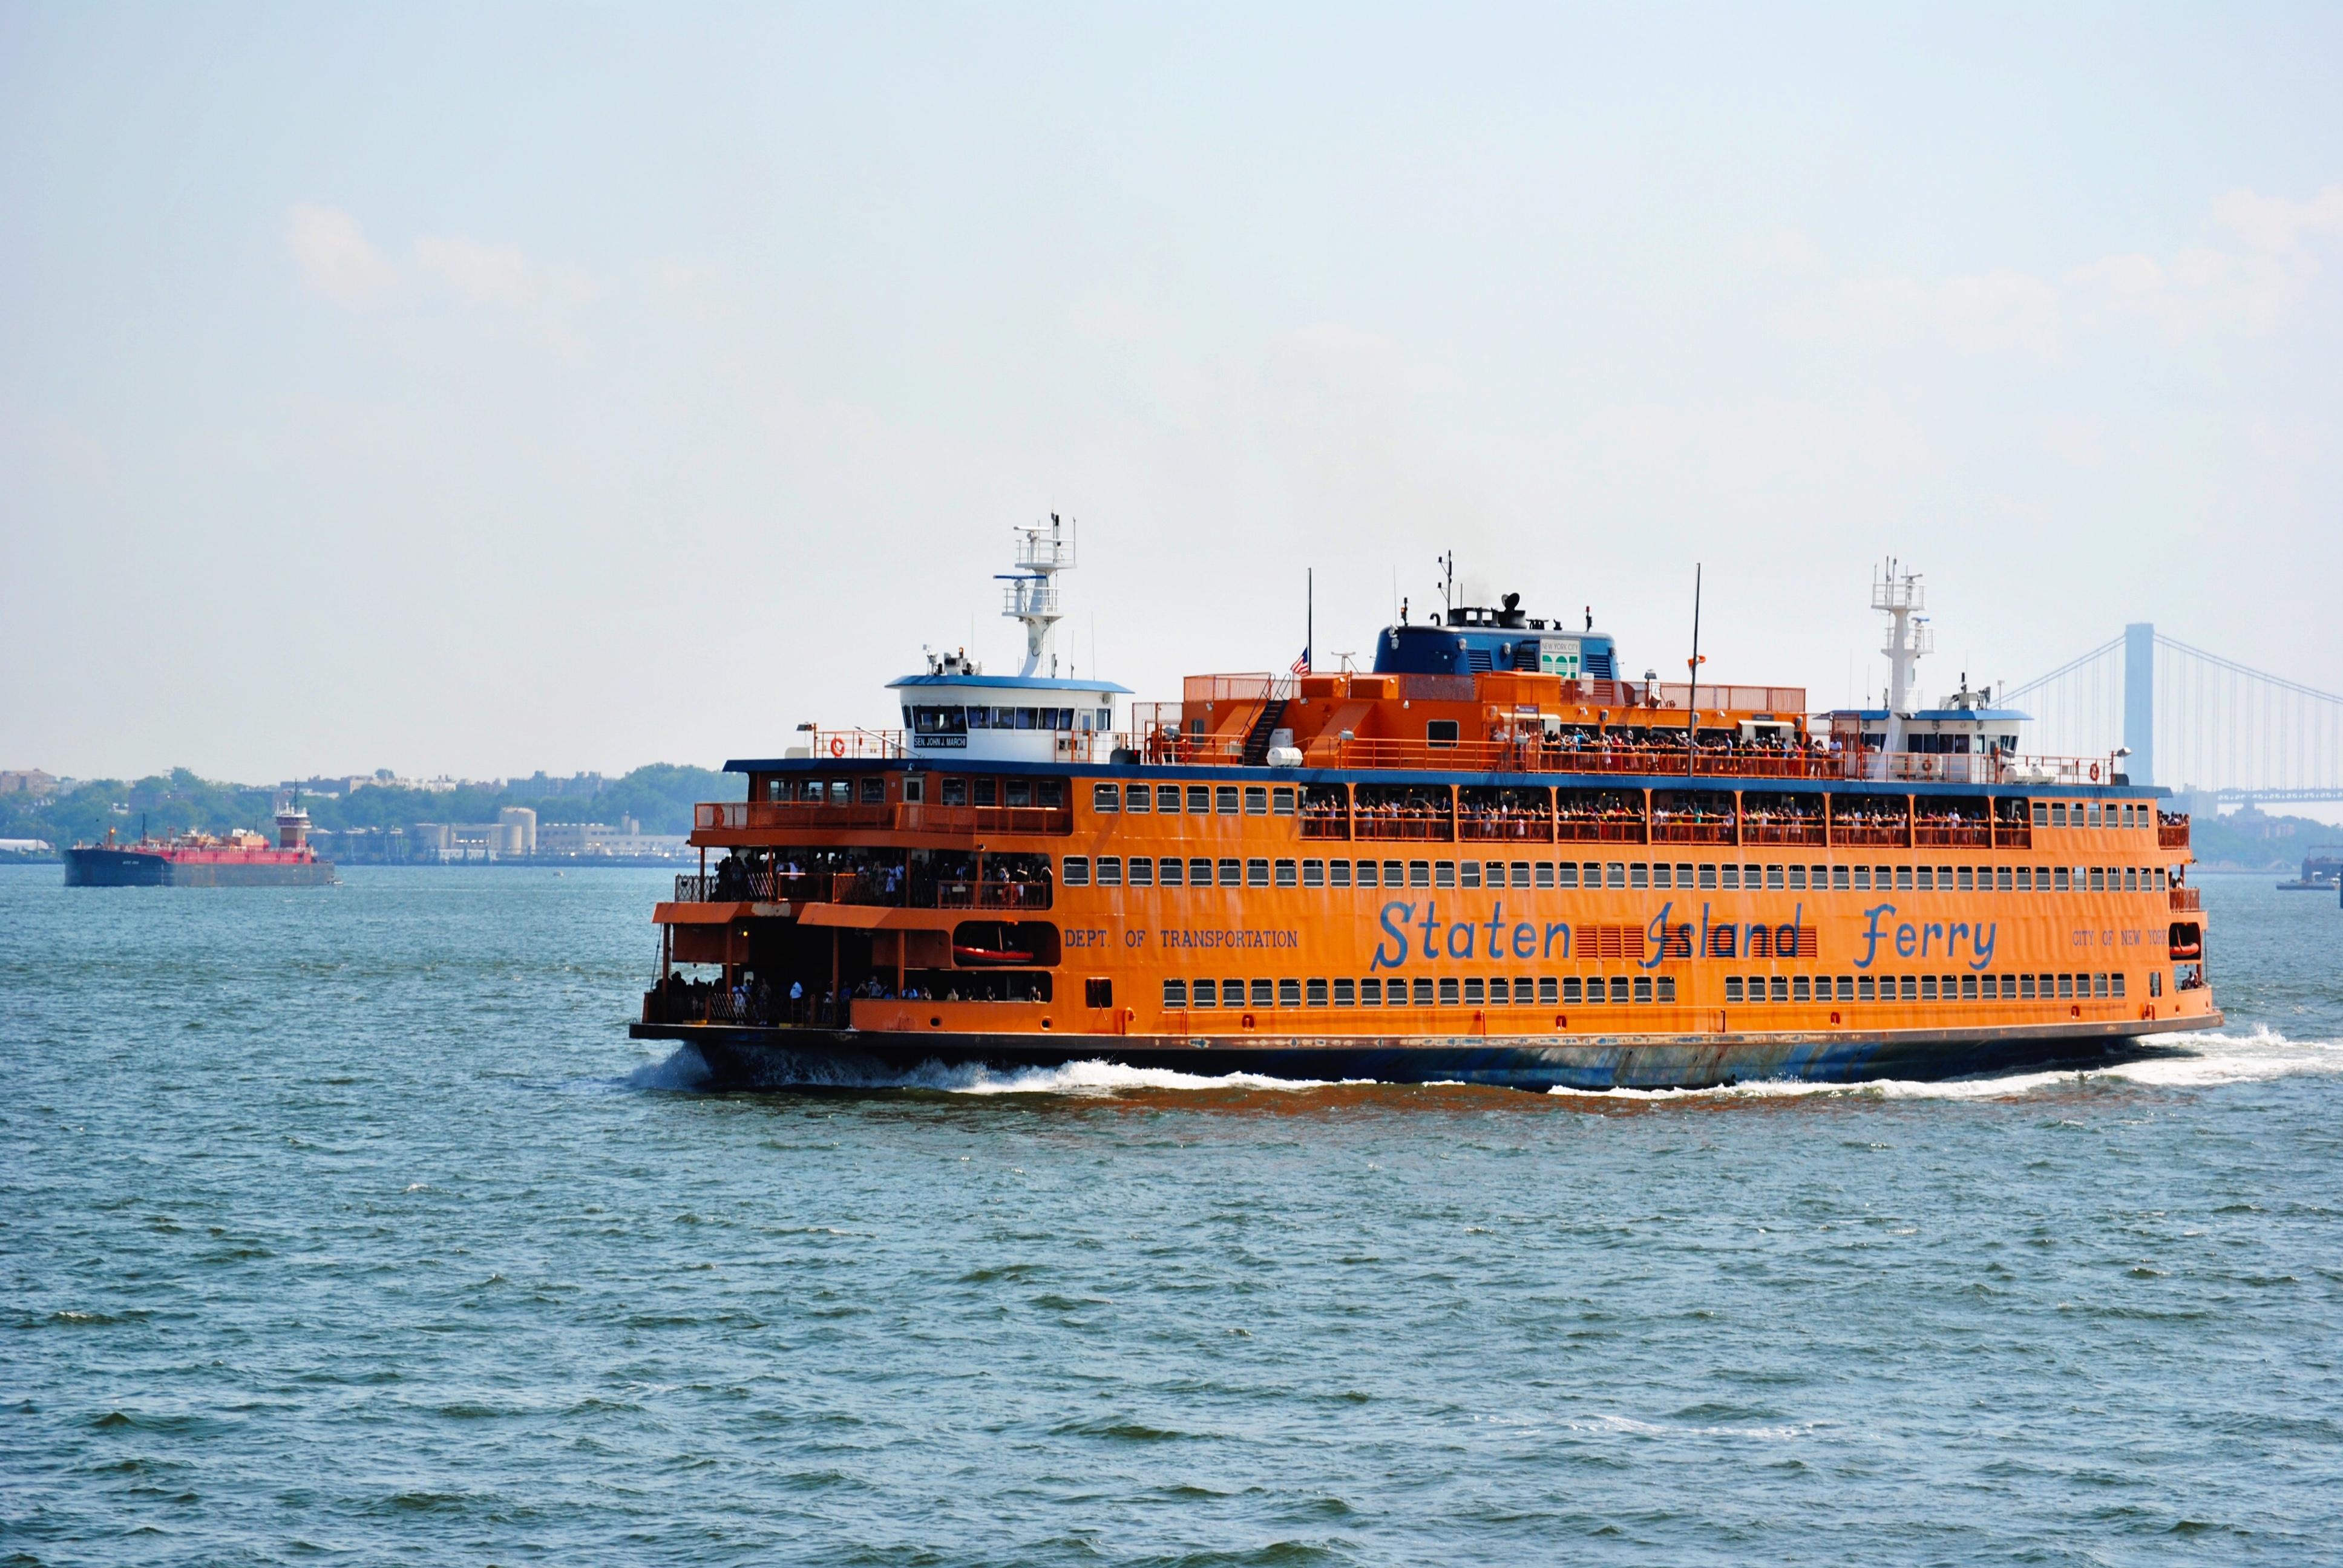 Take the Staten Island Ferry